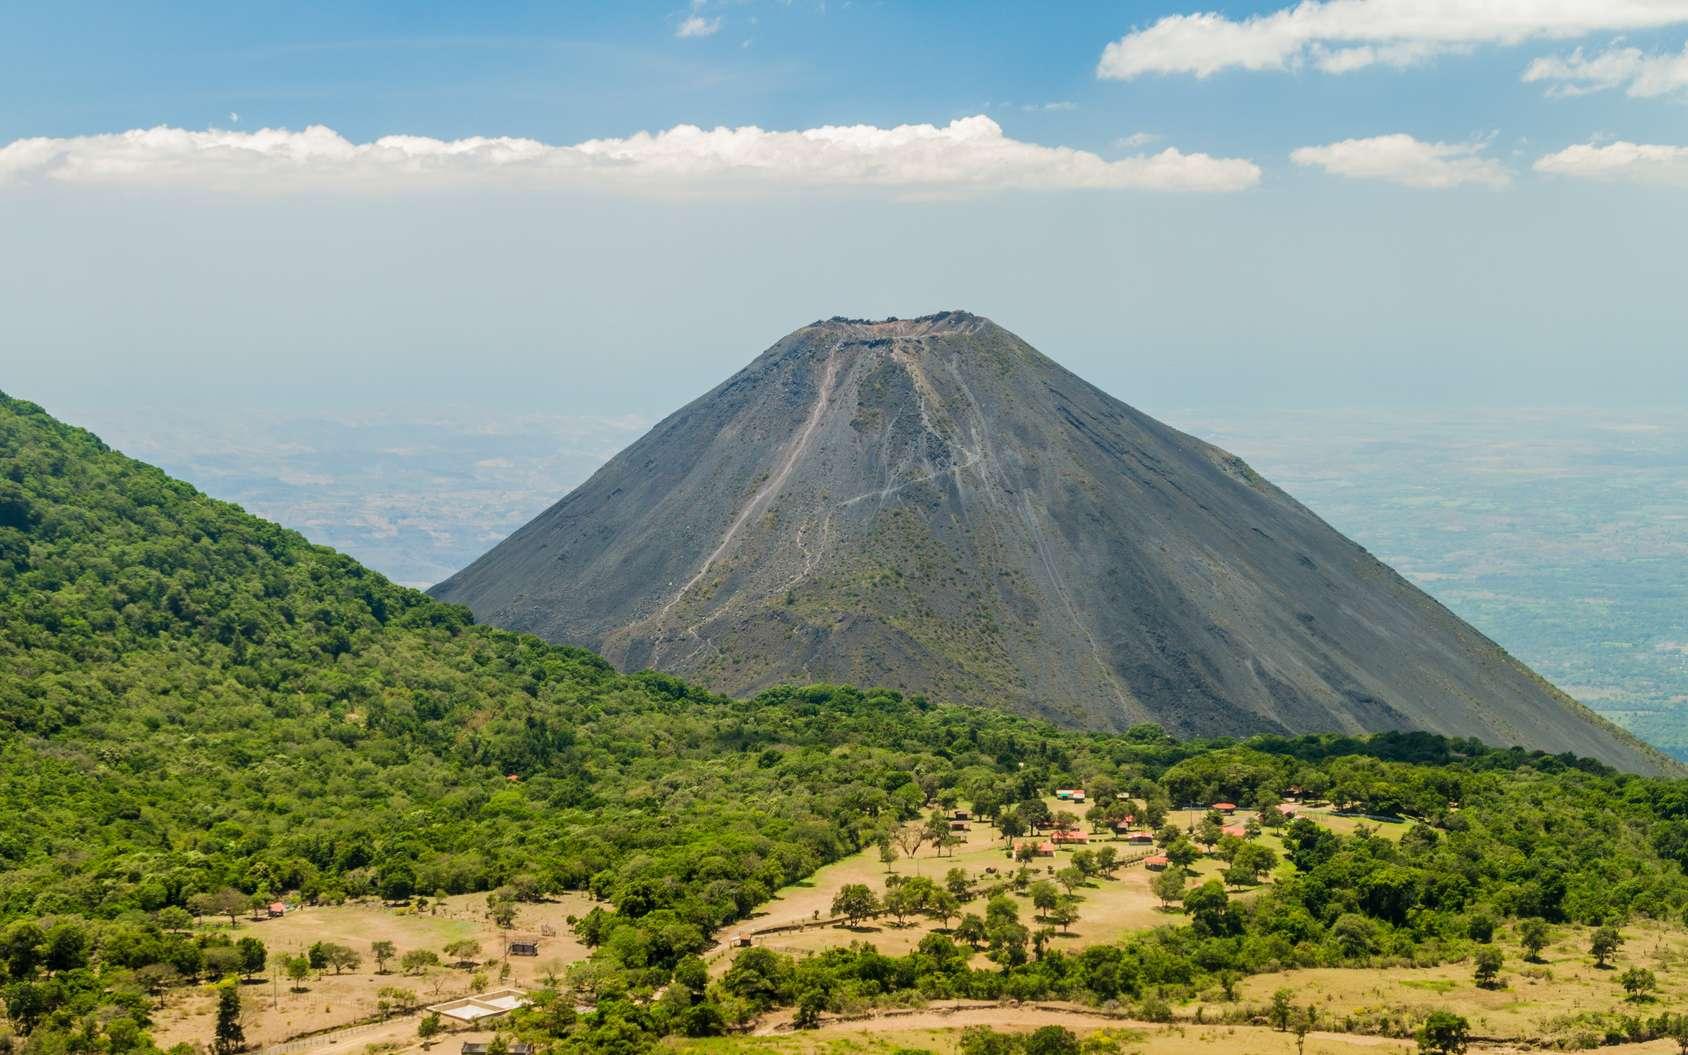 Le volcan Izalco. © Matyas Rehak, Fotolia